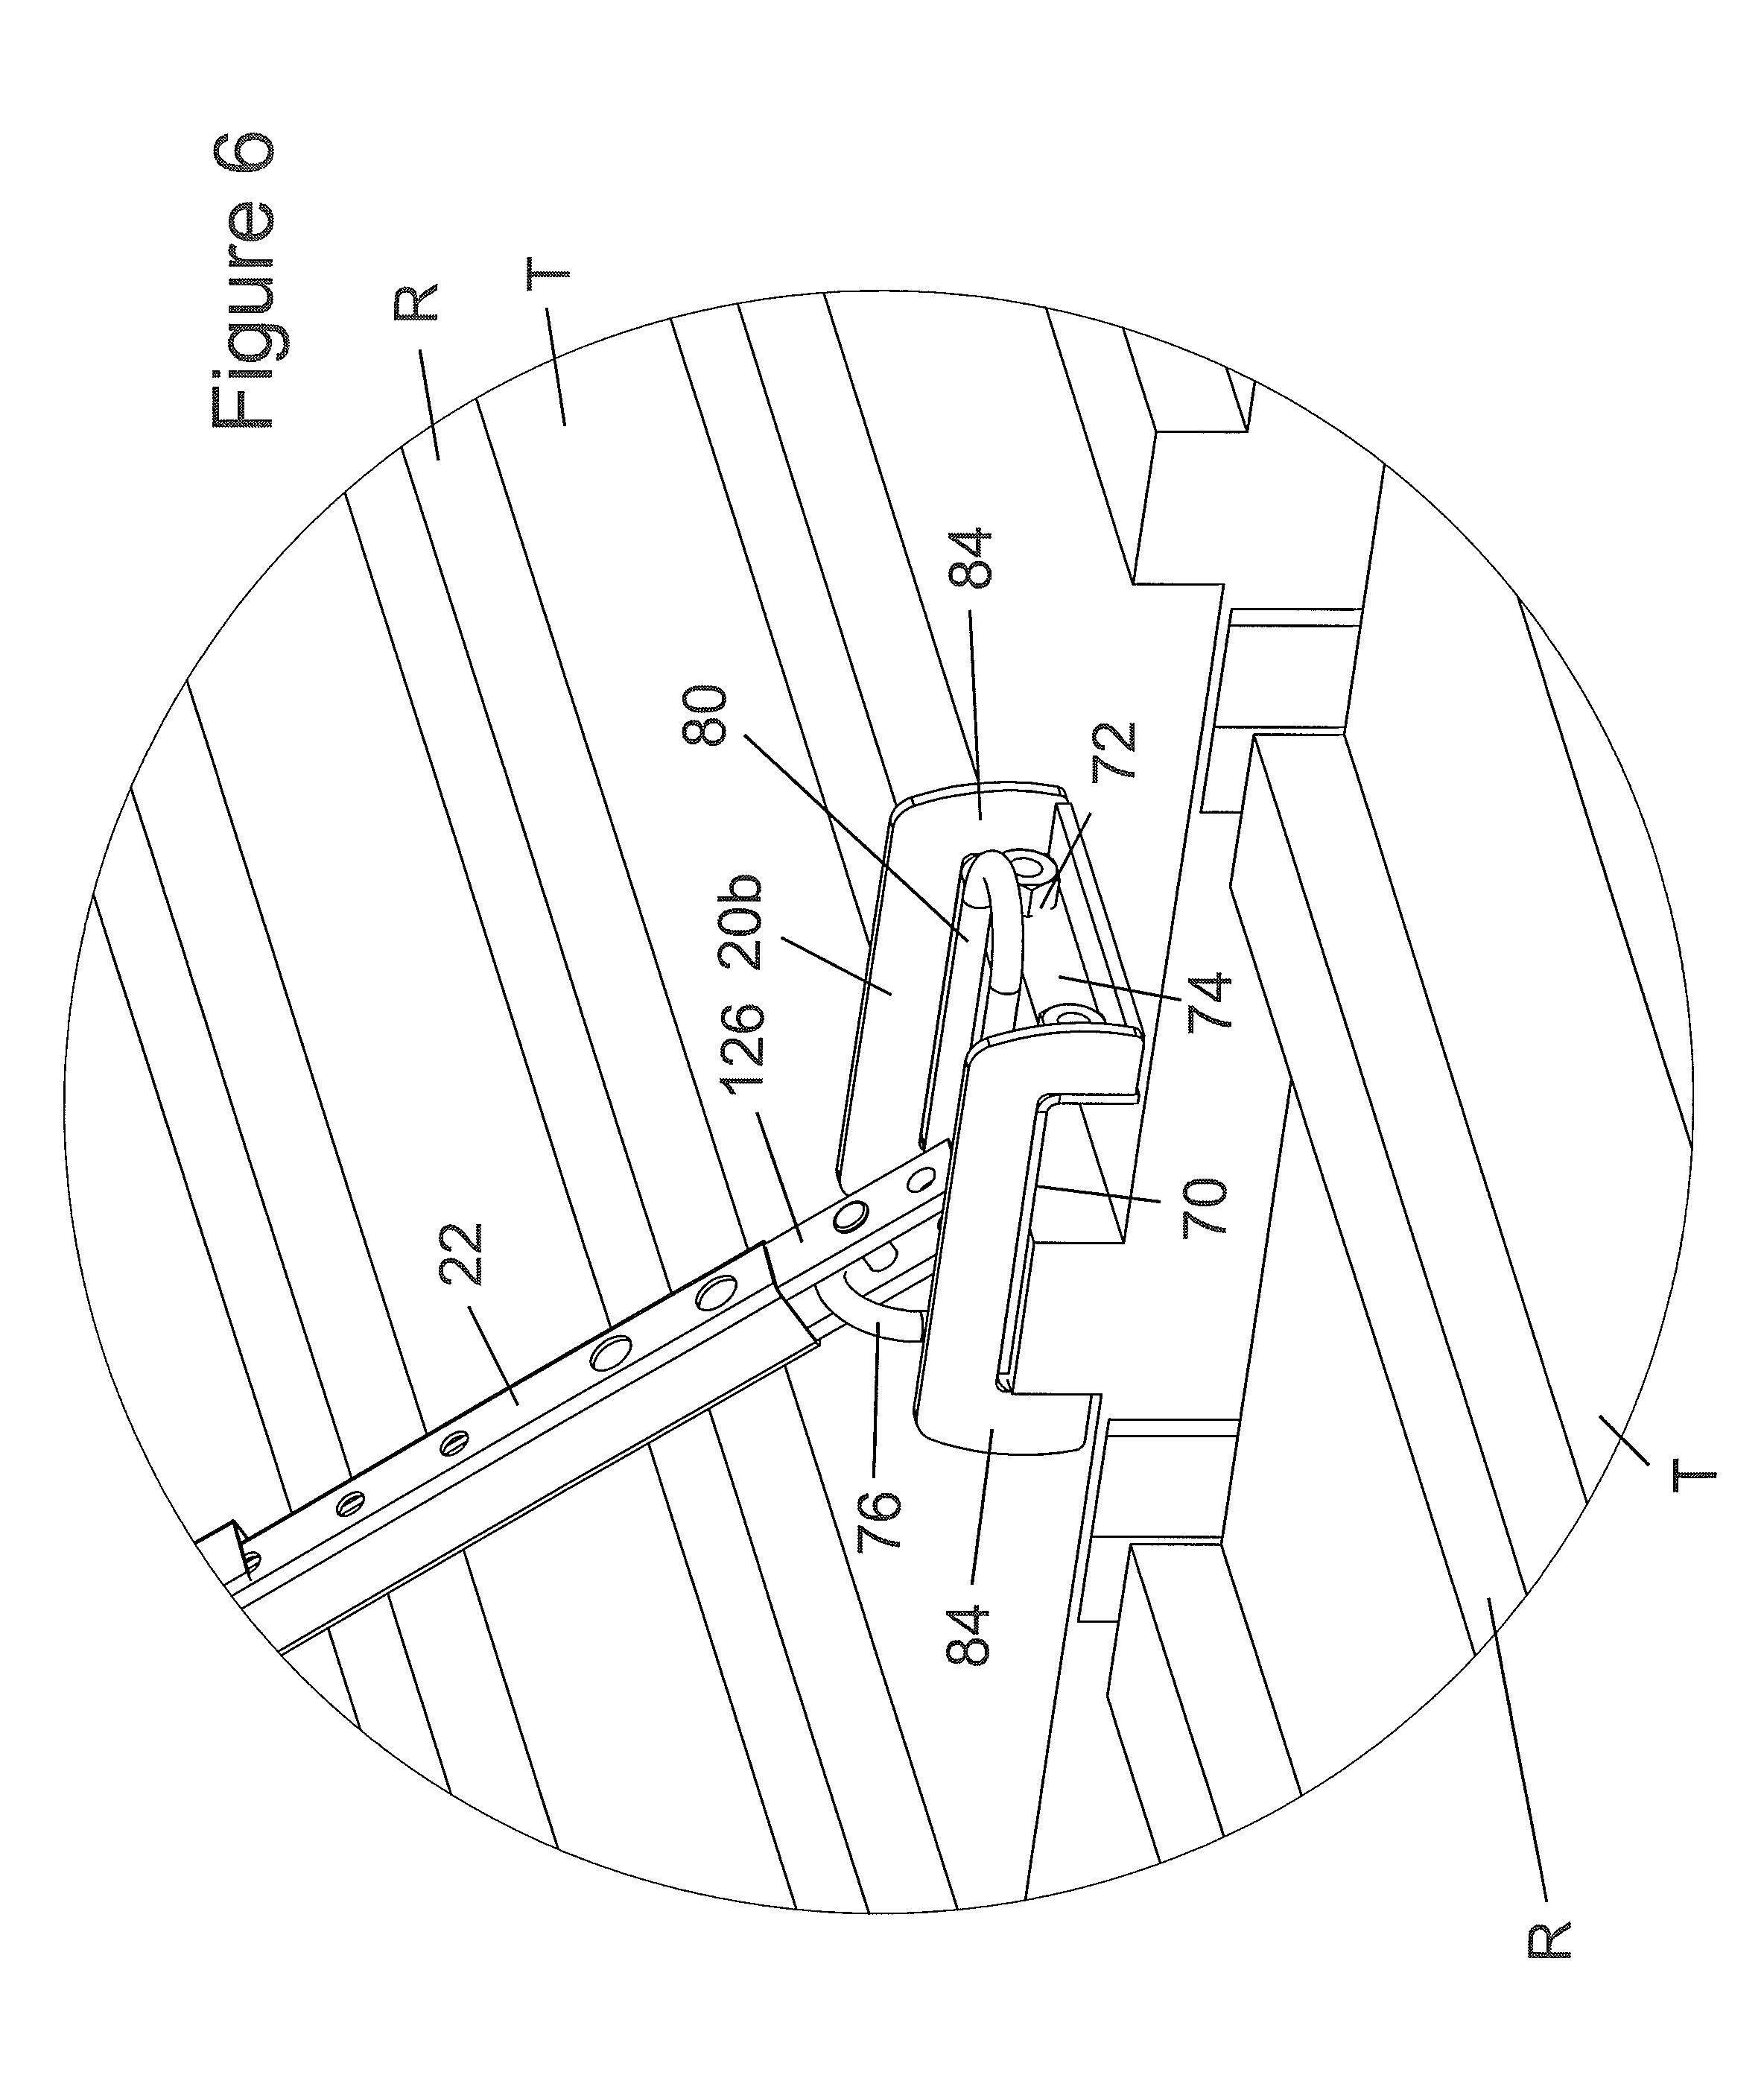 patent us8627923 tank lifeline system patents Frac Tank Storage patent drawing